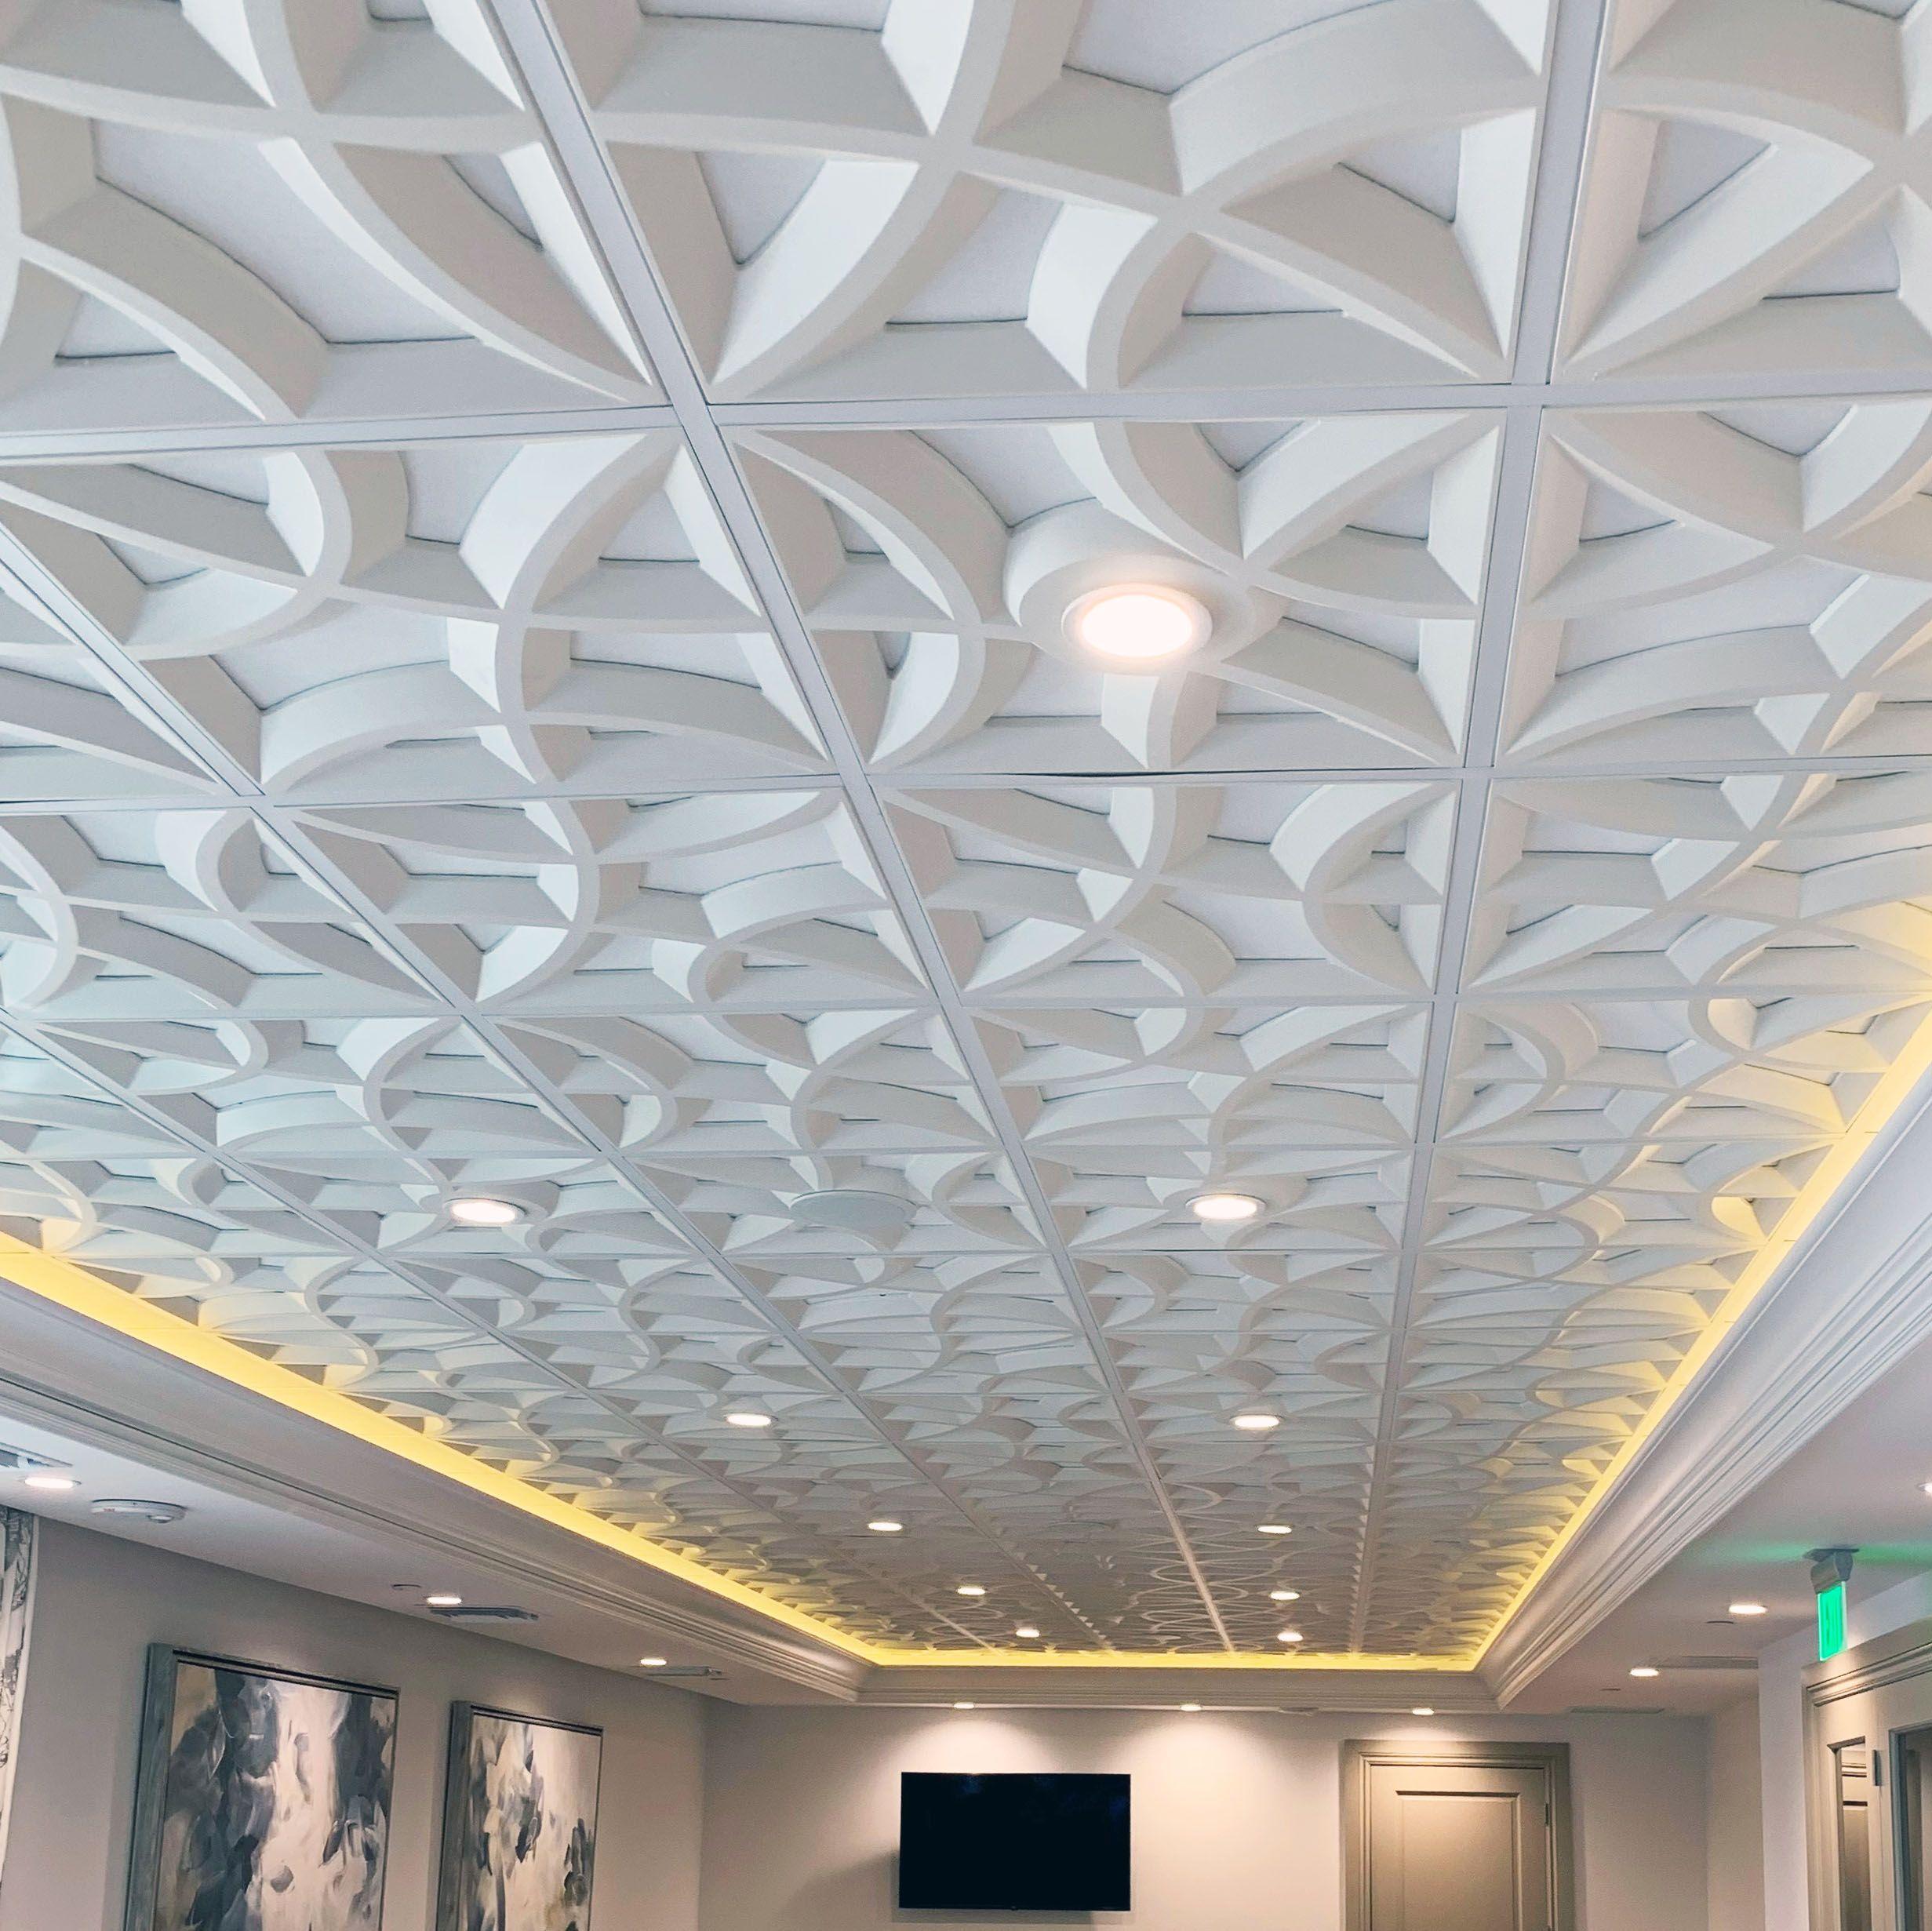 Crescent Path Acoustic Ceiling Tile Sound Reducing Decorative Plaster Ceiling Tile In 2020 Acoustic Ceiling Tiles Contemporary Ceiling Tile Acoustical Ceiling